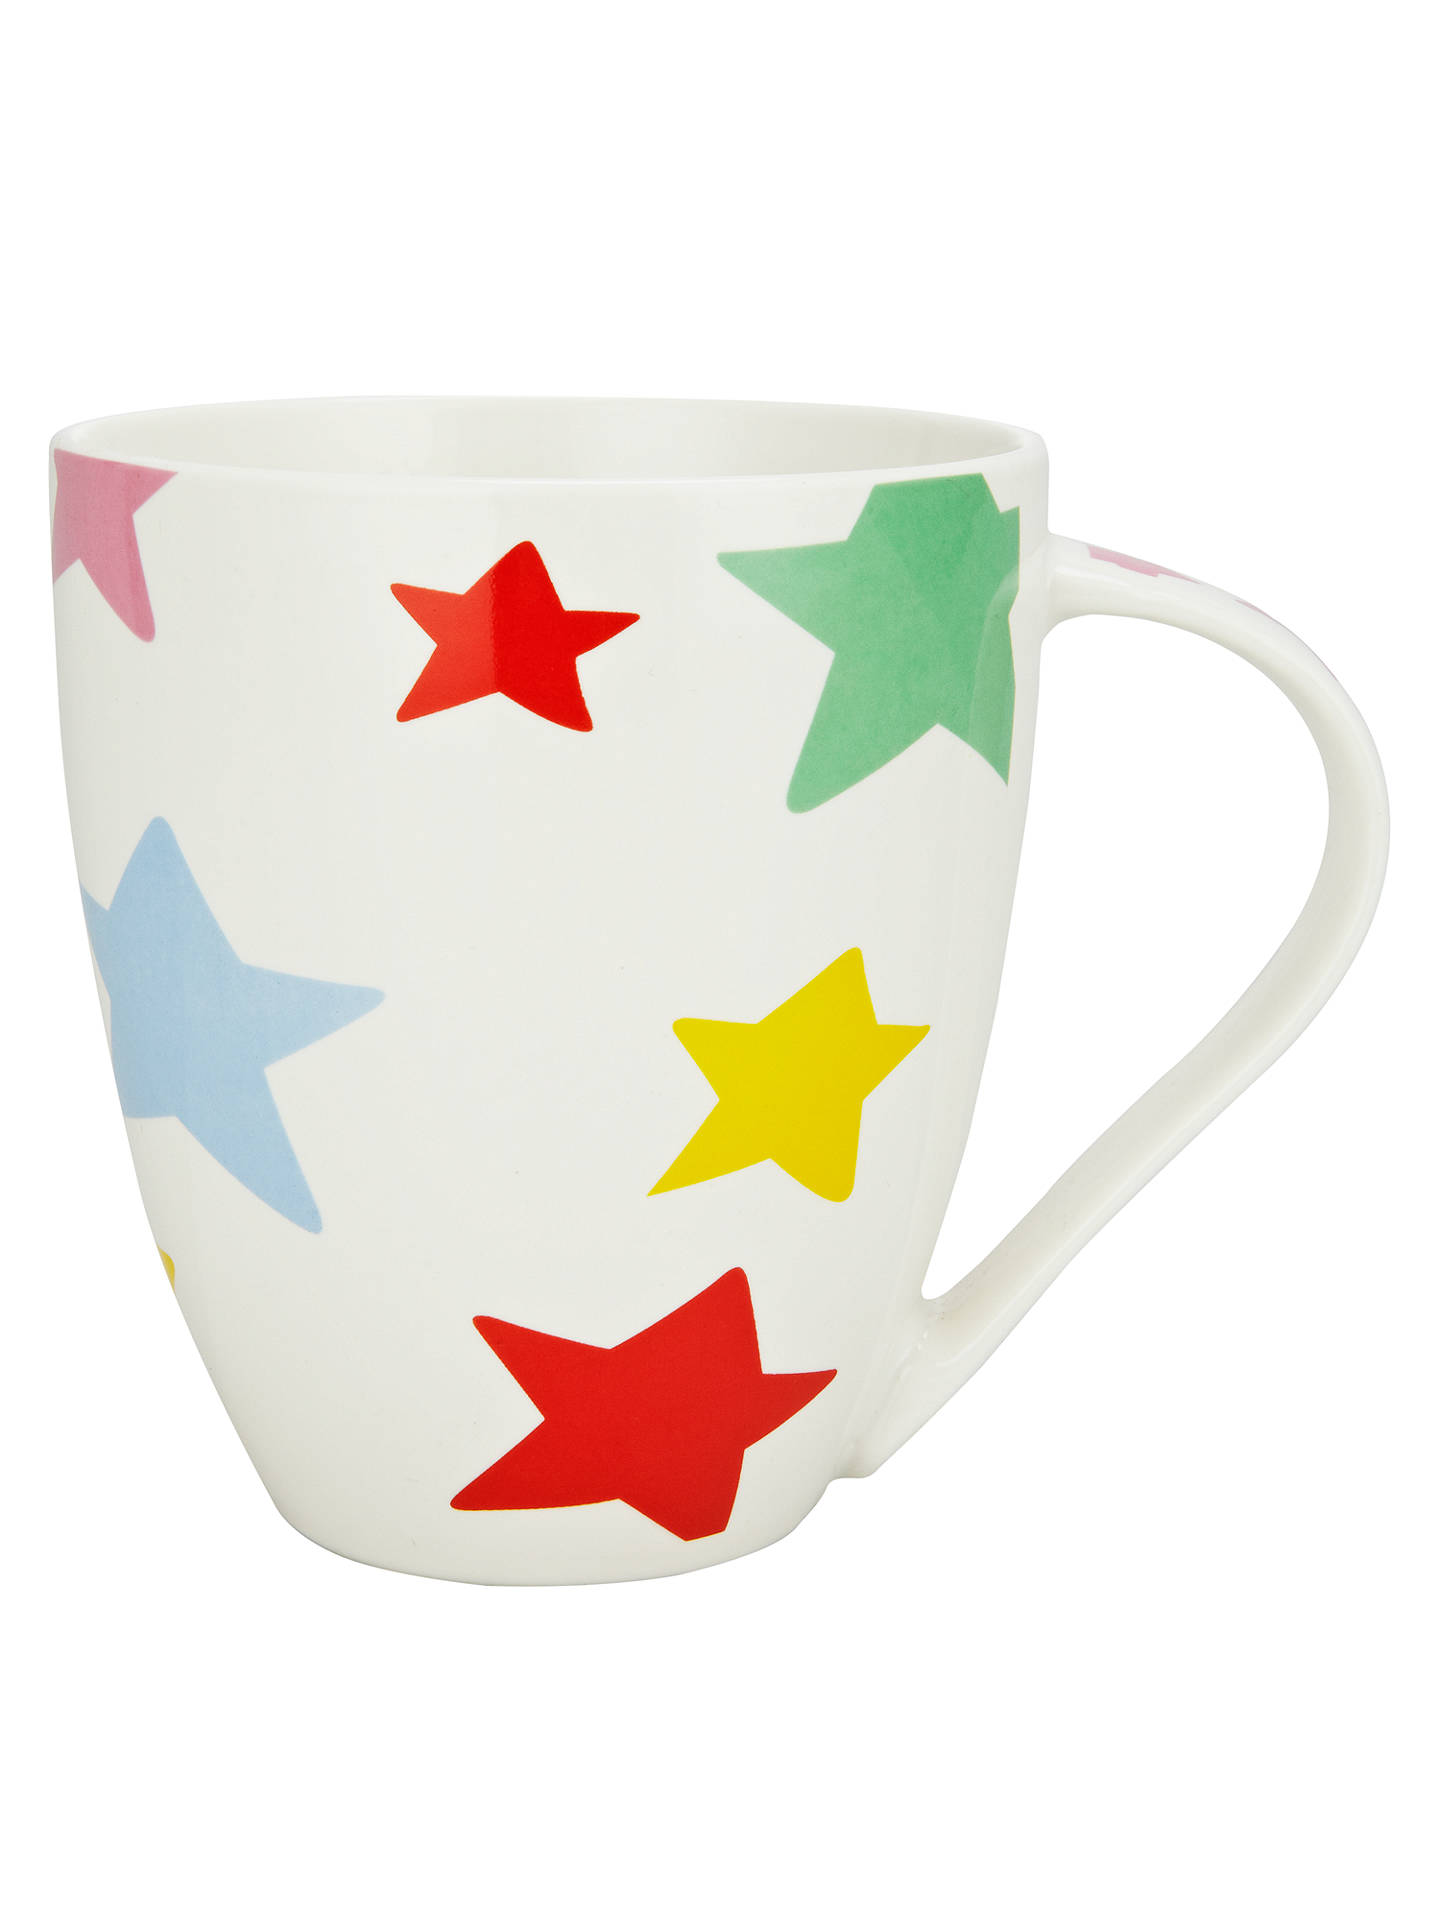 Cath Lewisamp; Kidston Mug0 John Partners At Stars 5l stdhQr